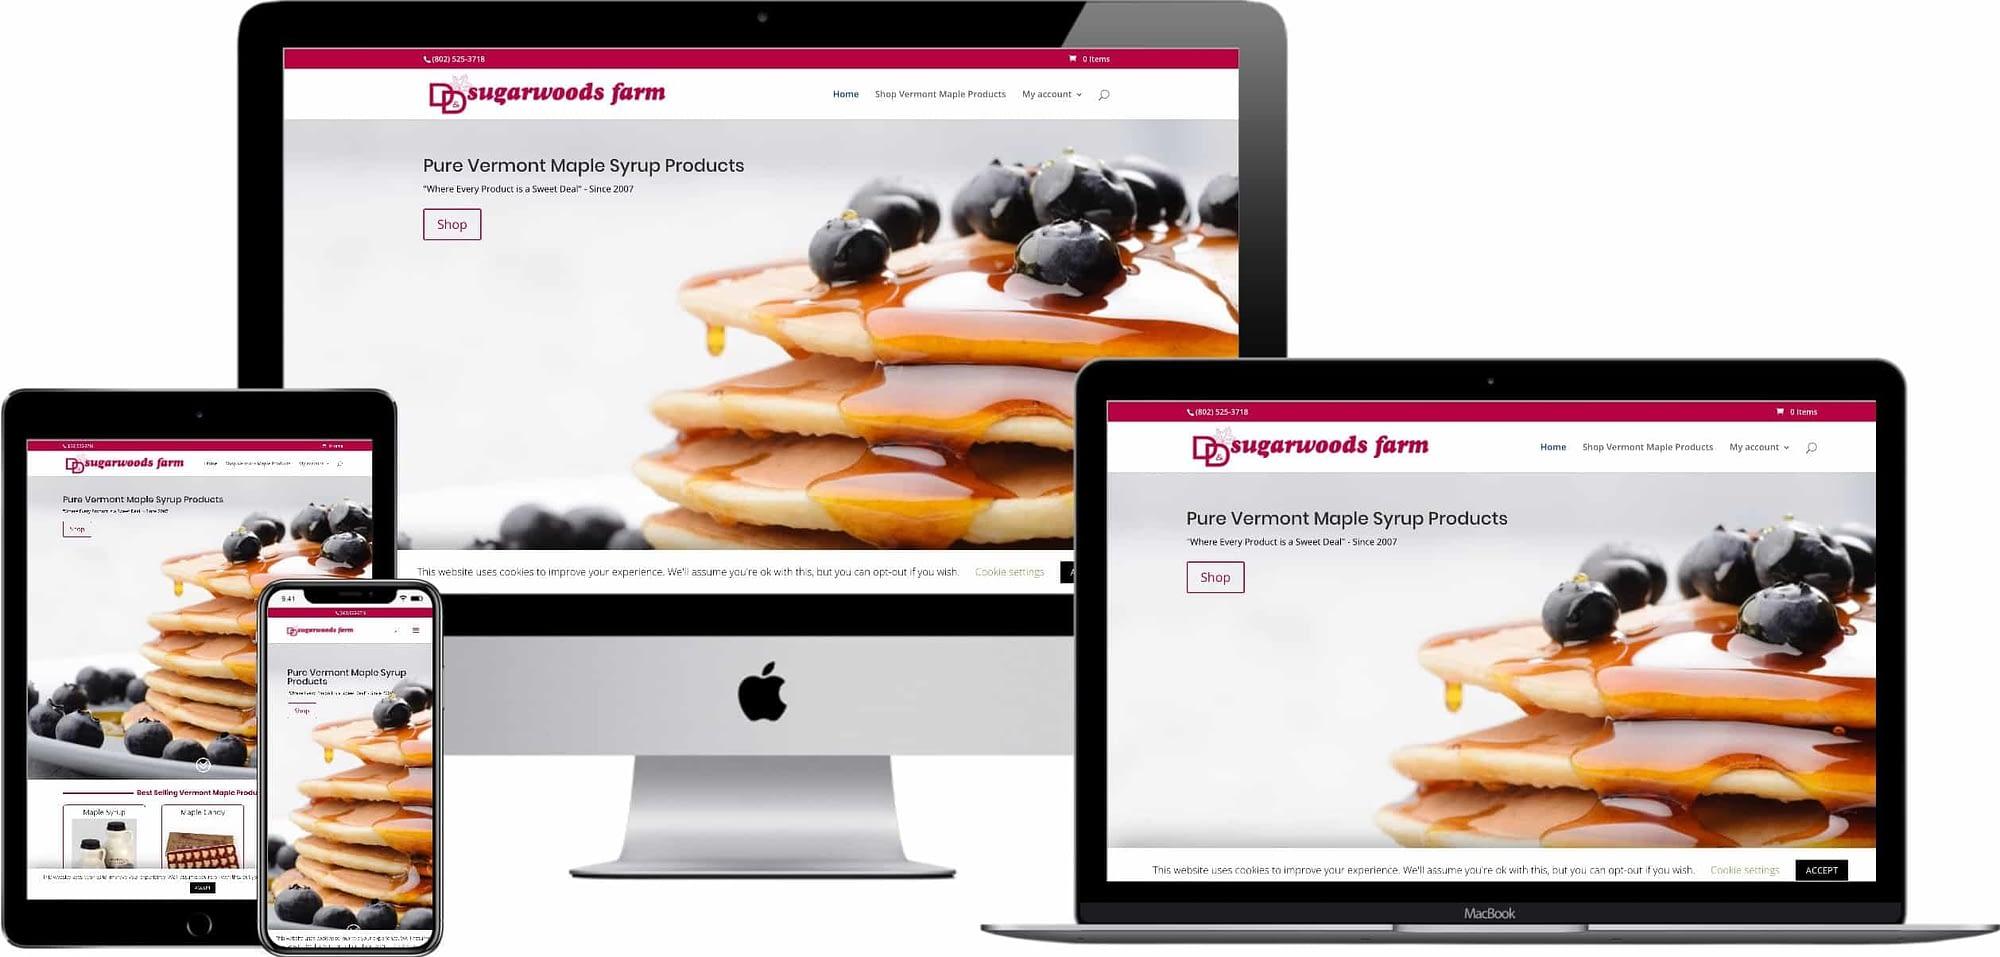 Responsive Web Design - D&D Sugarwoods Farm